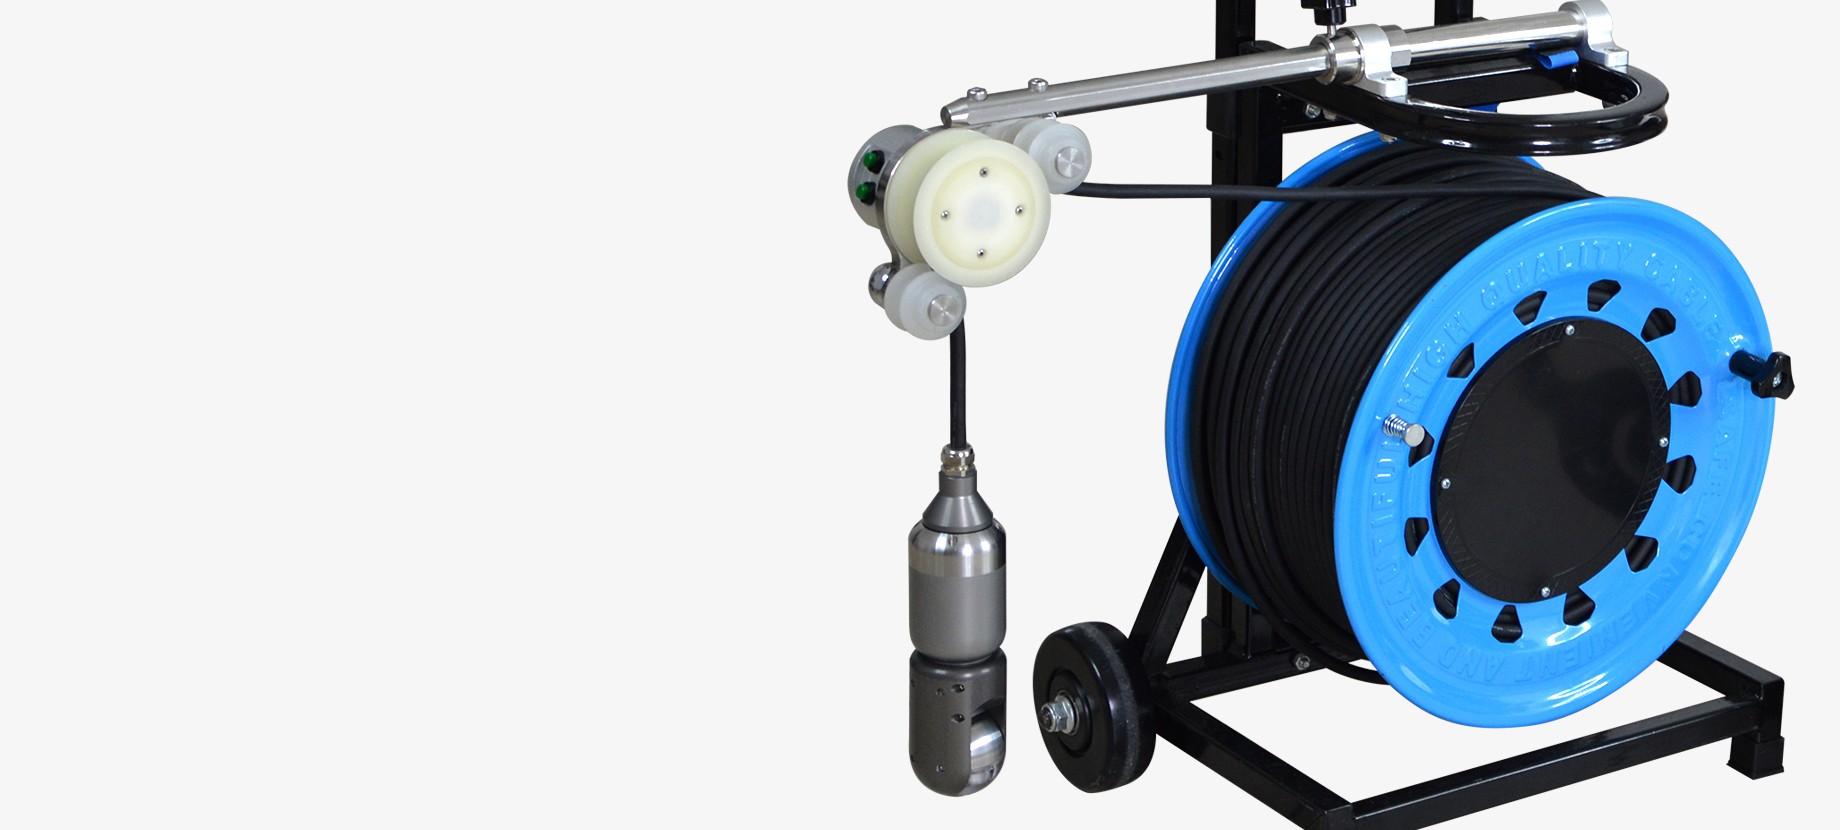 Caméra d'inspection verticale